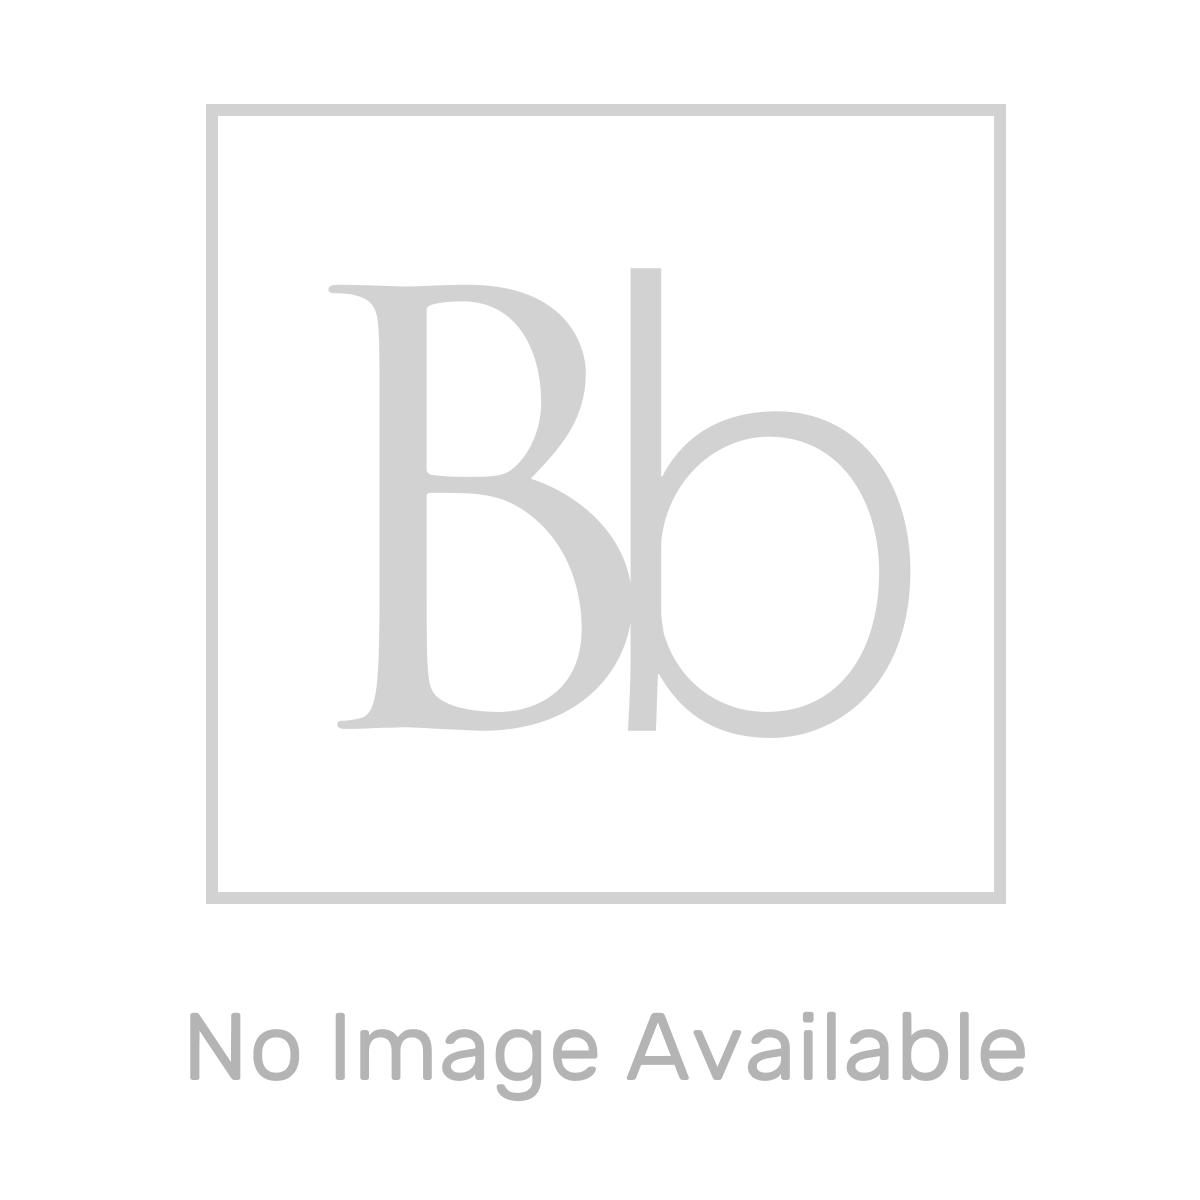 Mito Floor Standing Vanity Unit 400mm Drawing 1